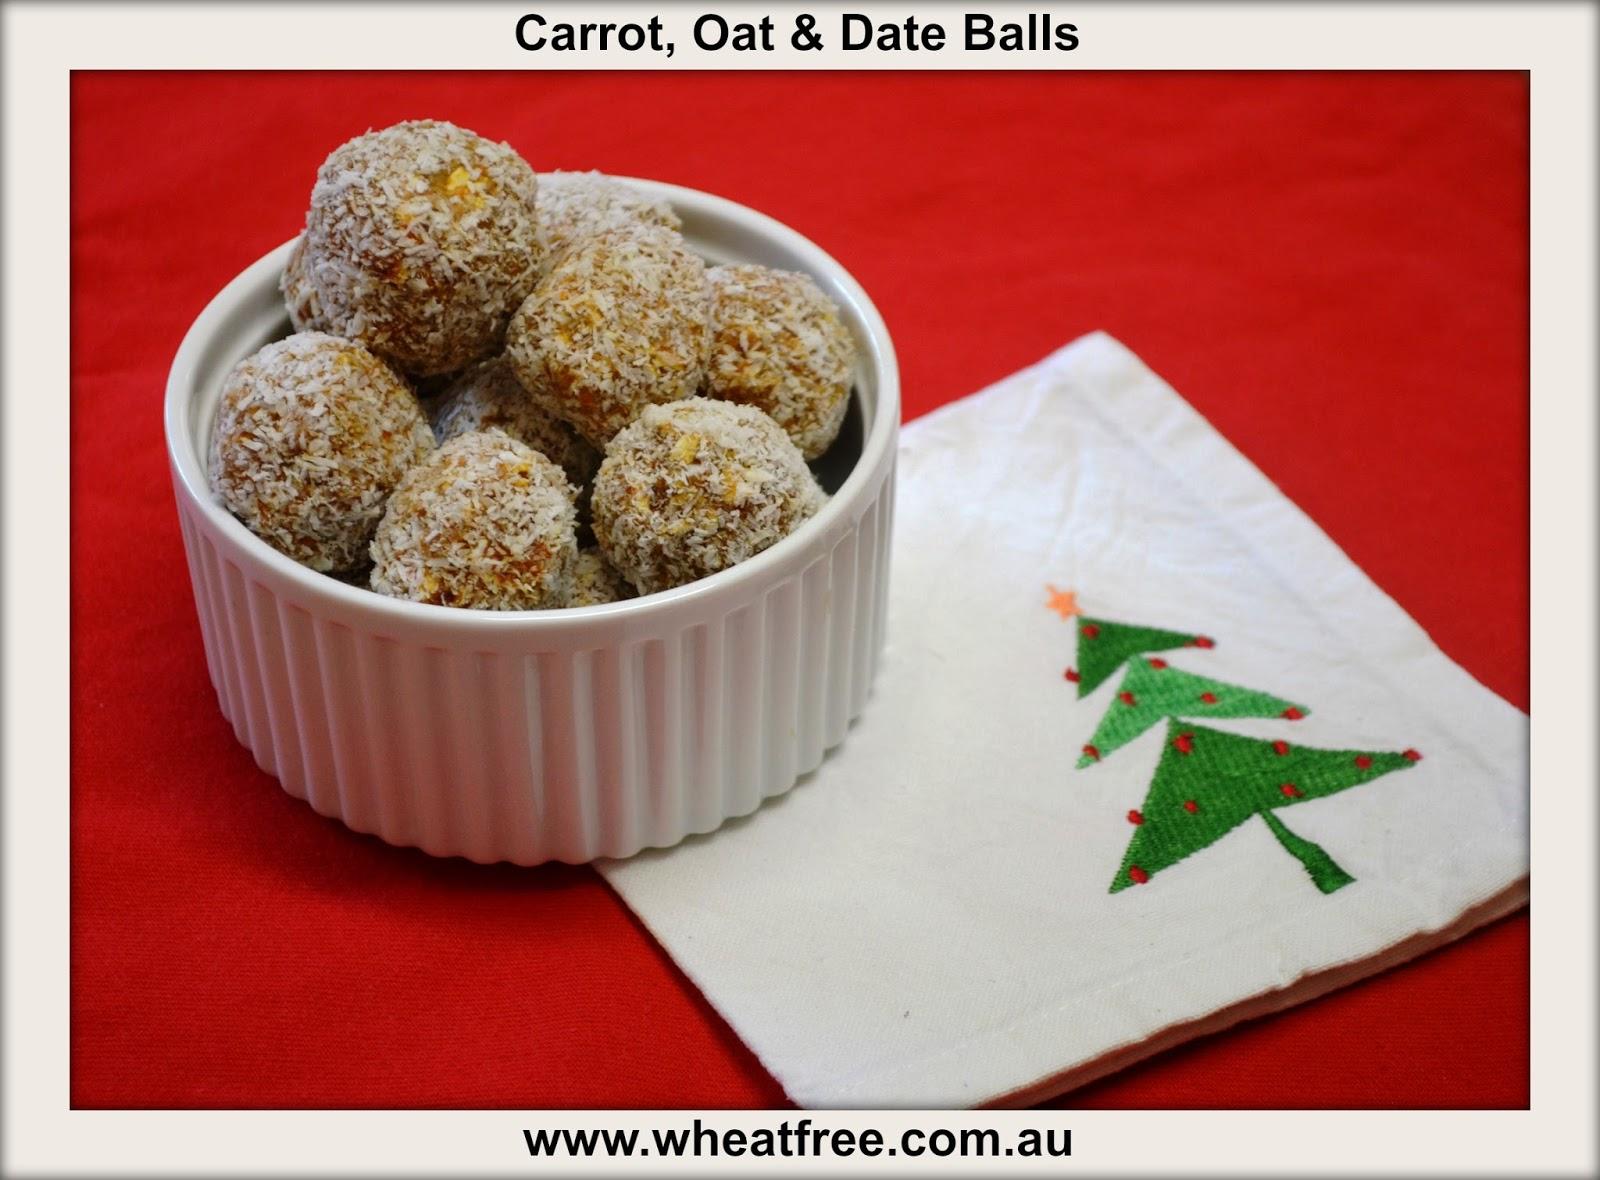 Date balls in Australia